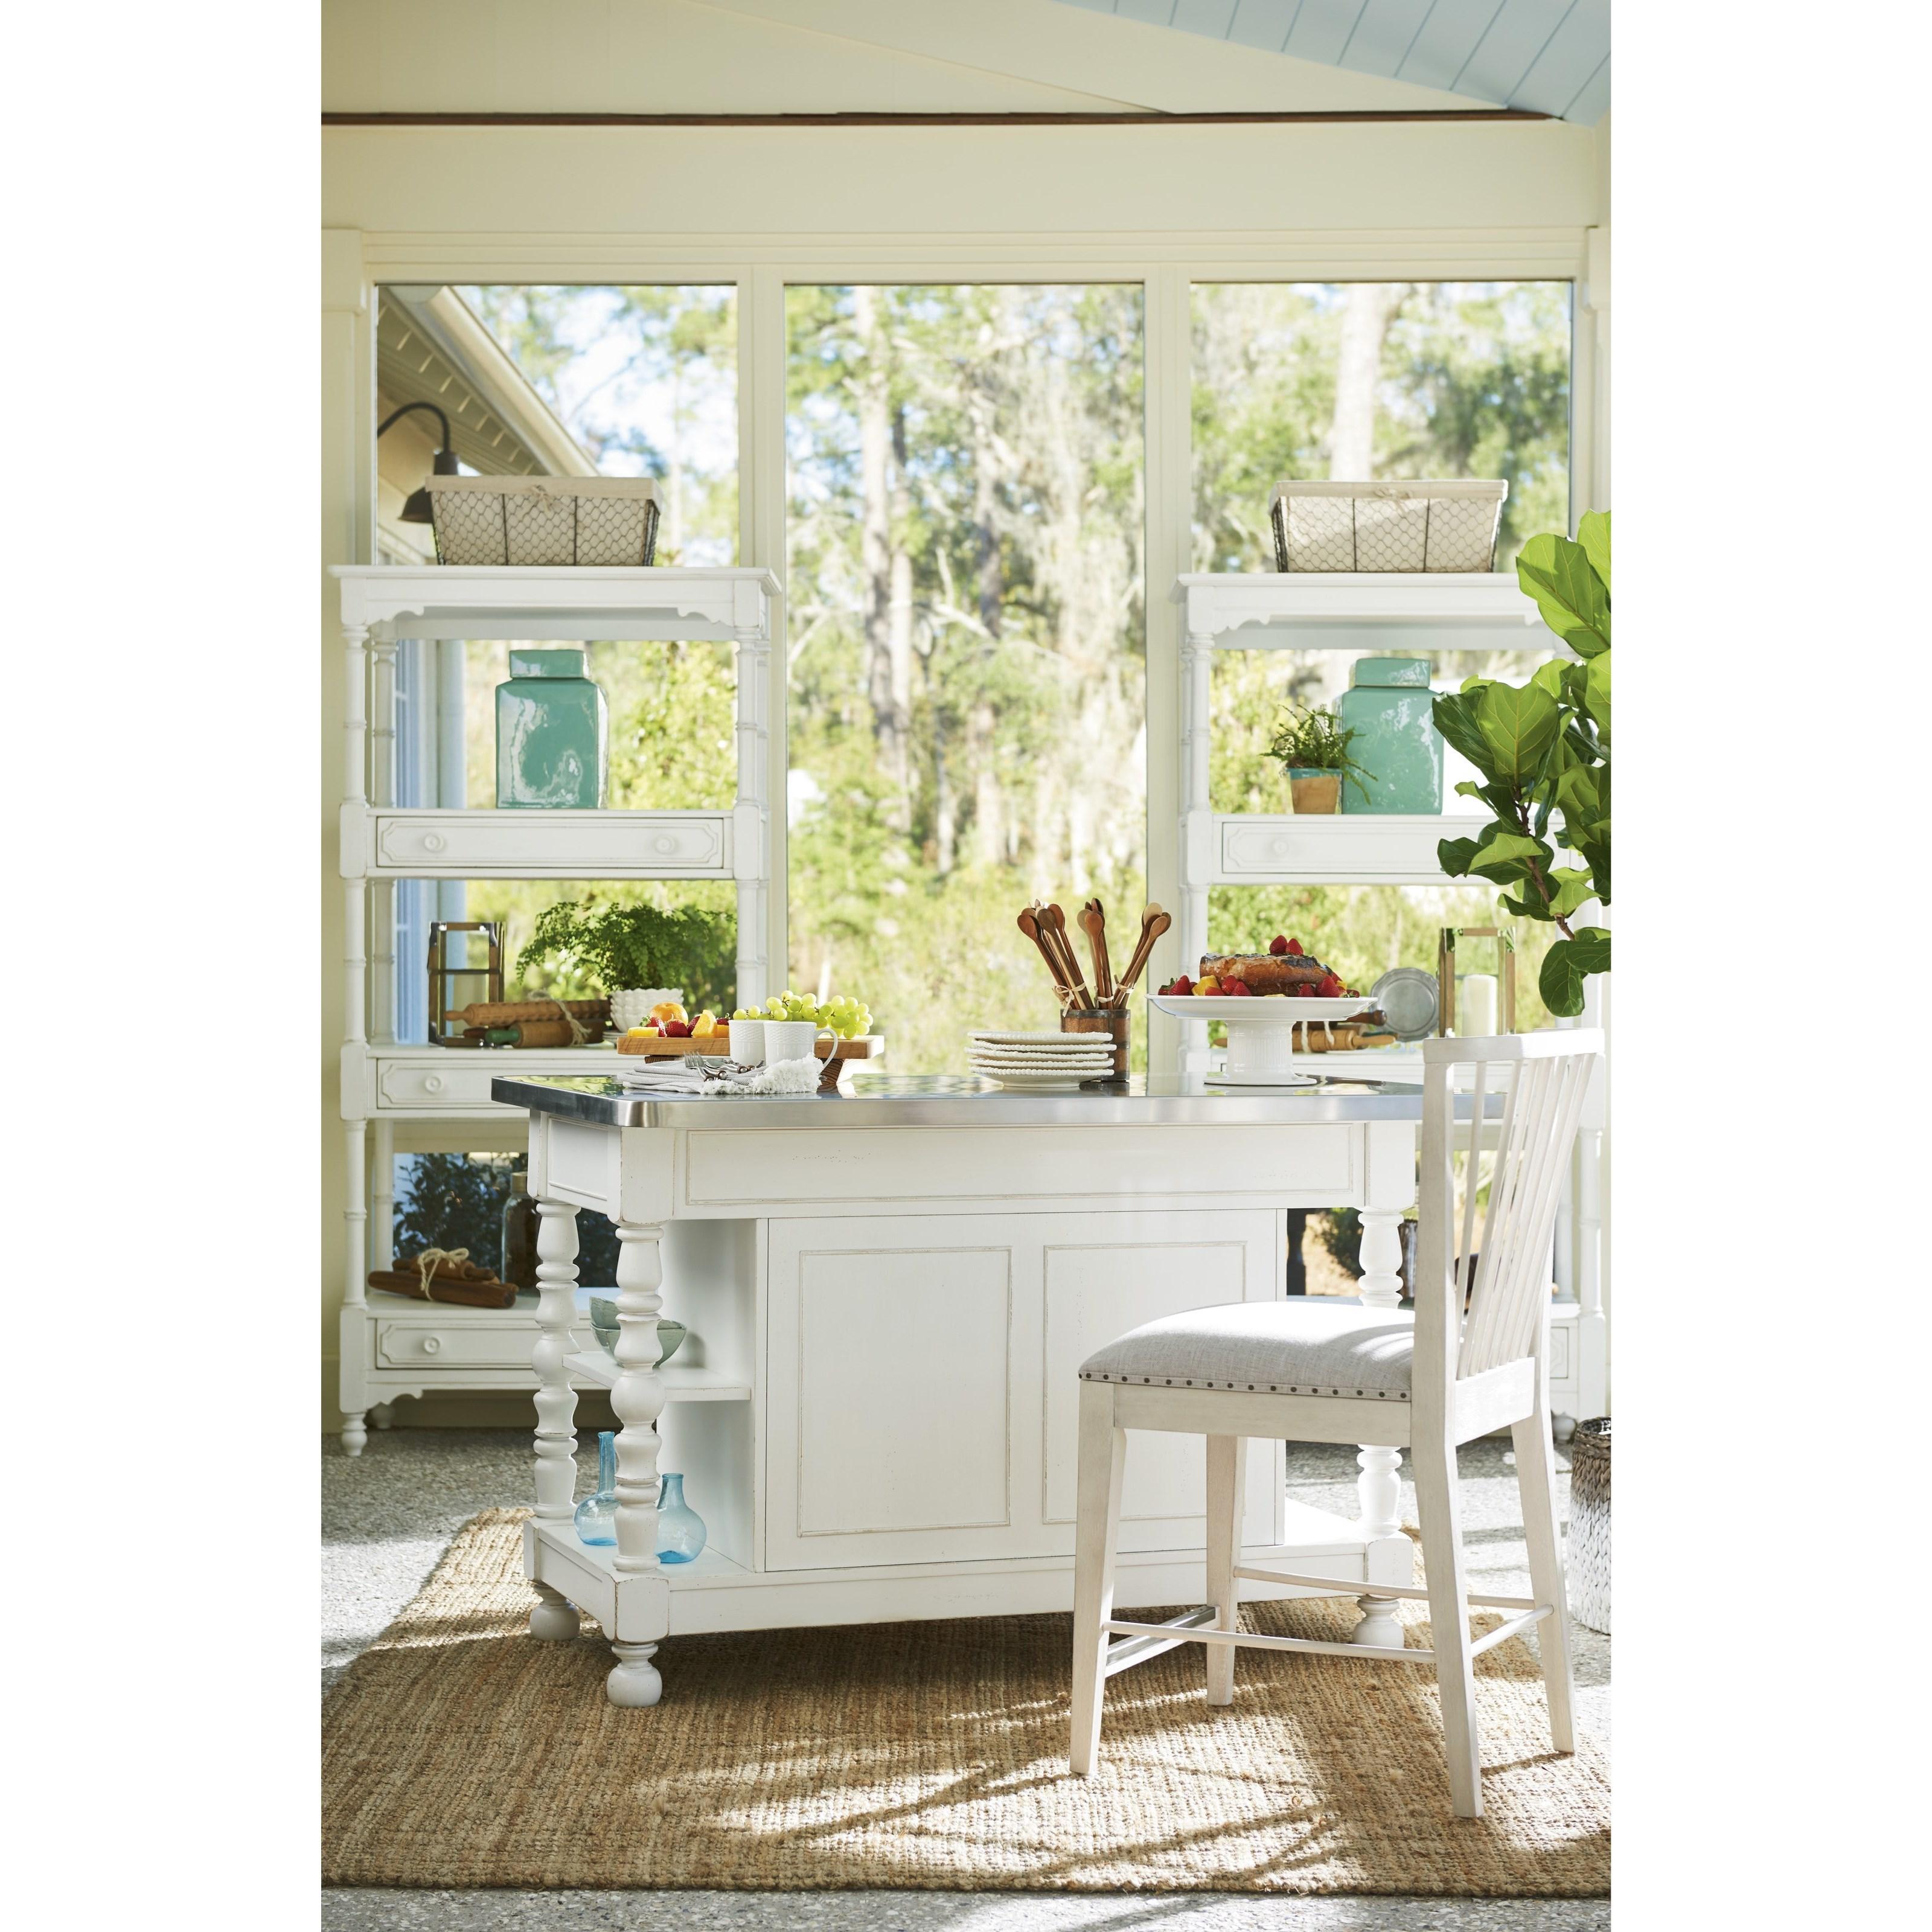 Paula Deen By Universal Bungalow Cottage Kitchen Island